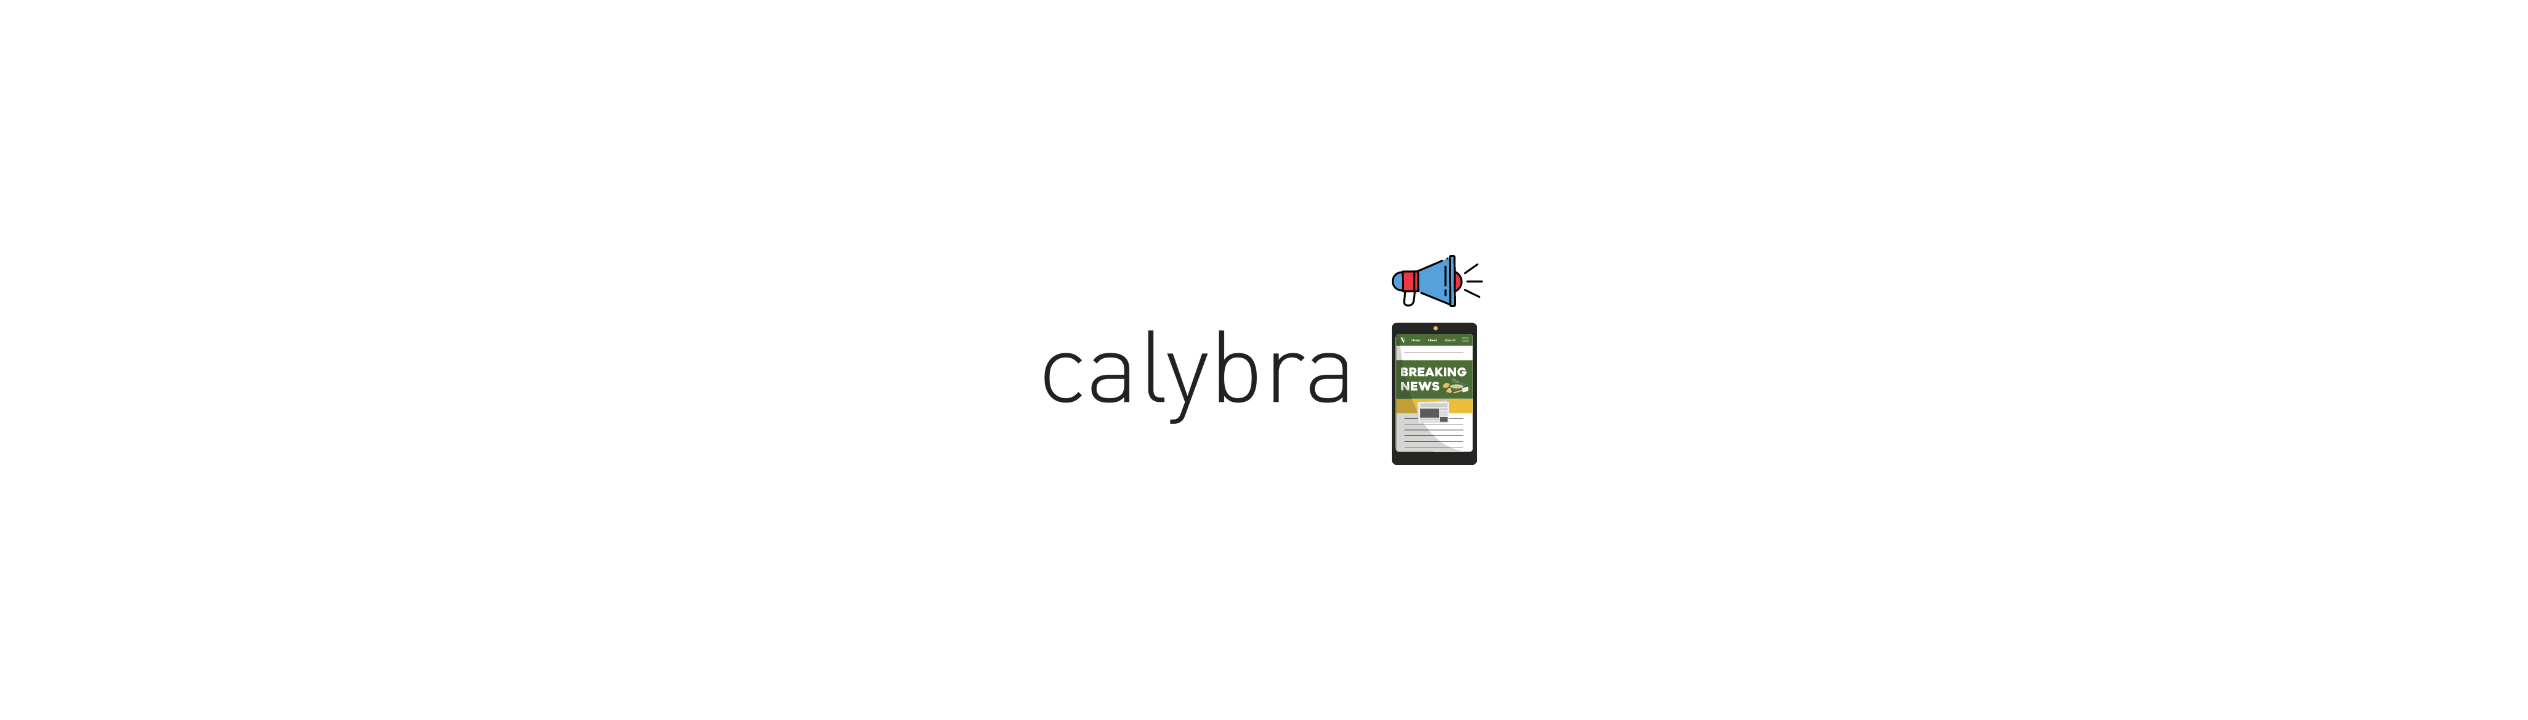 calybra news